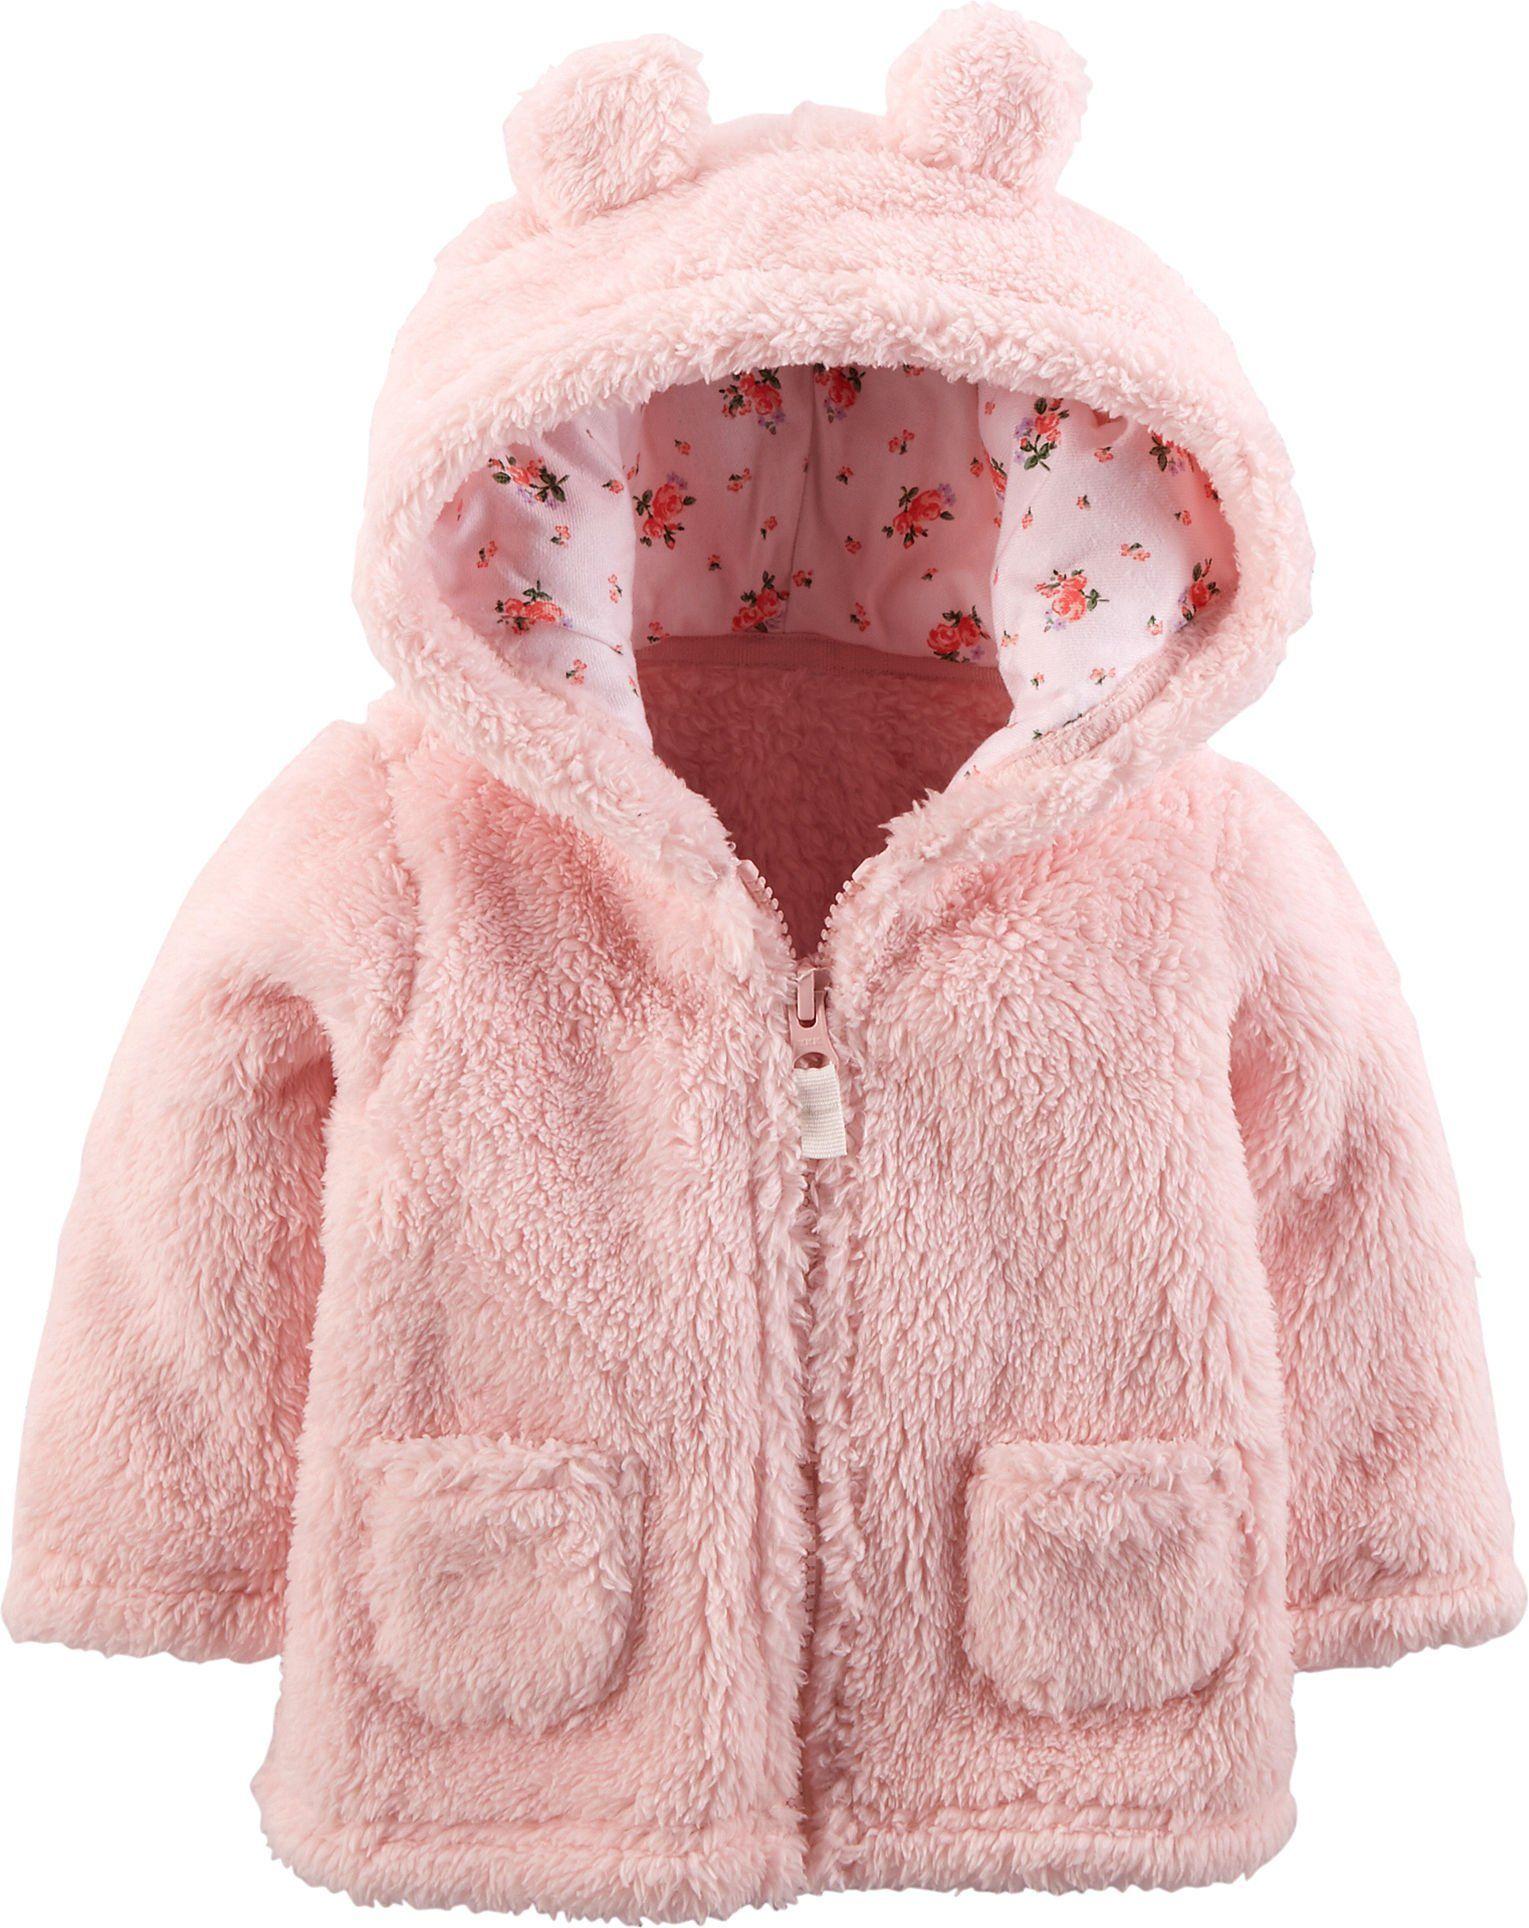 b4ebd782b195 Carters Unisex Baby Hooded Sherpa Jacket (6 Months